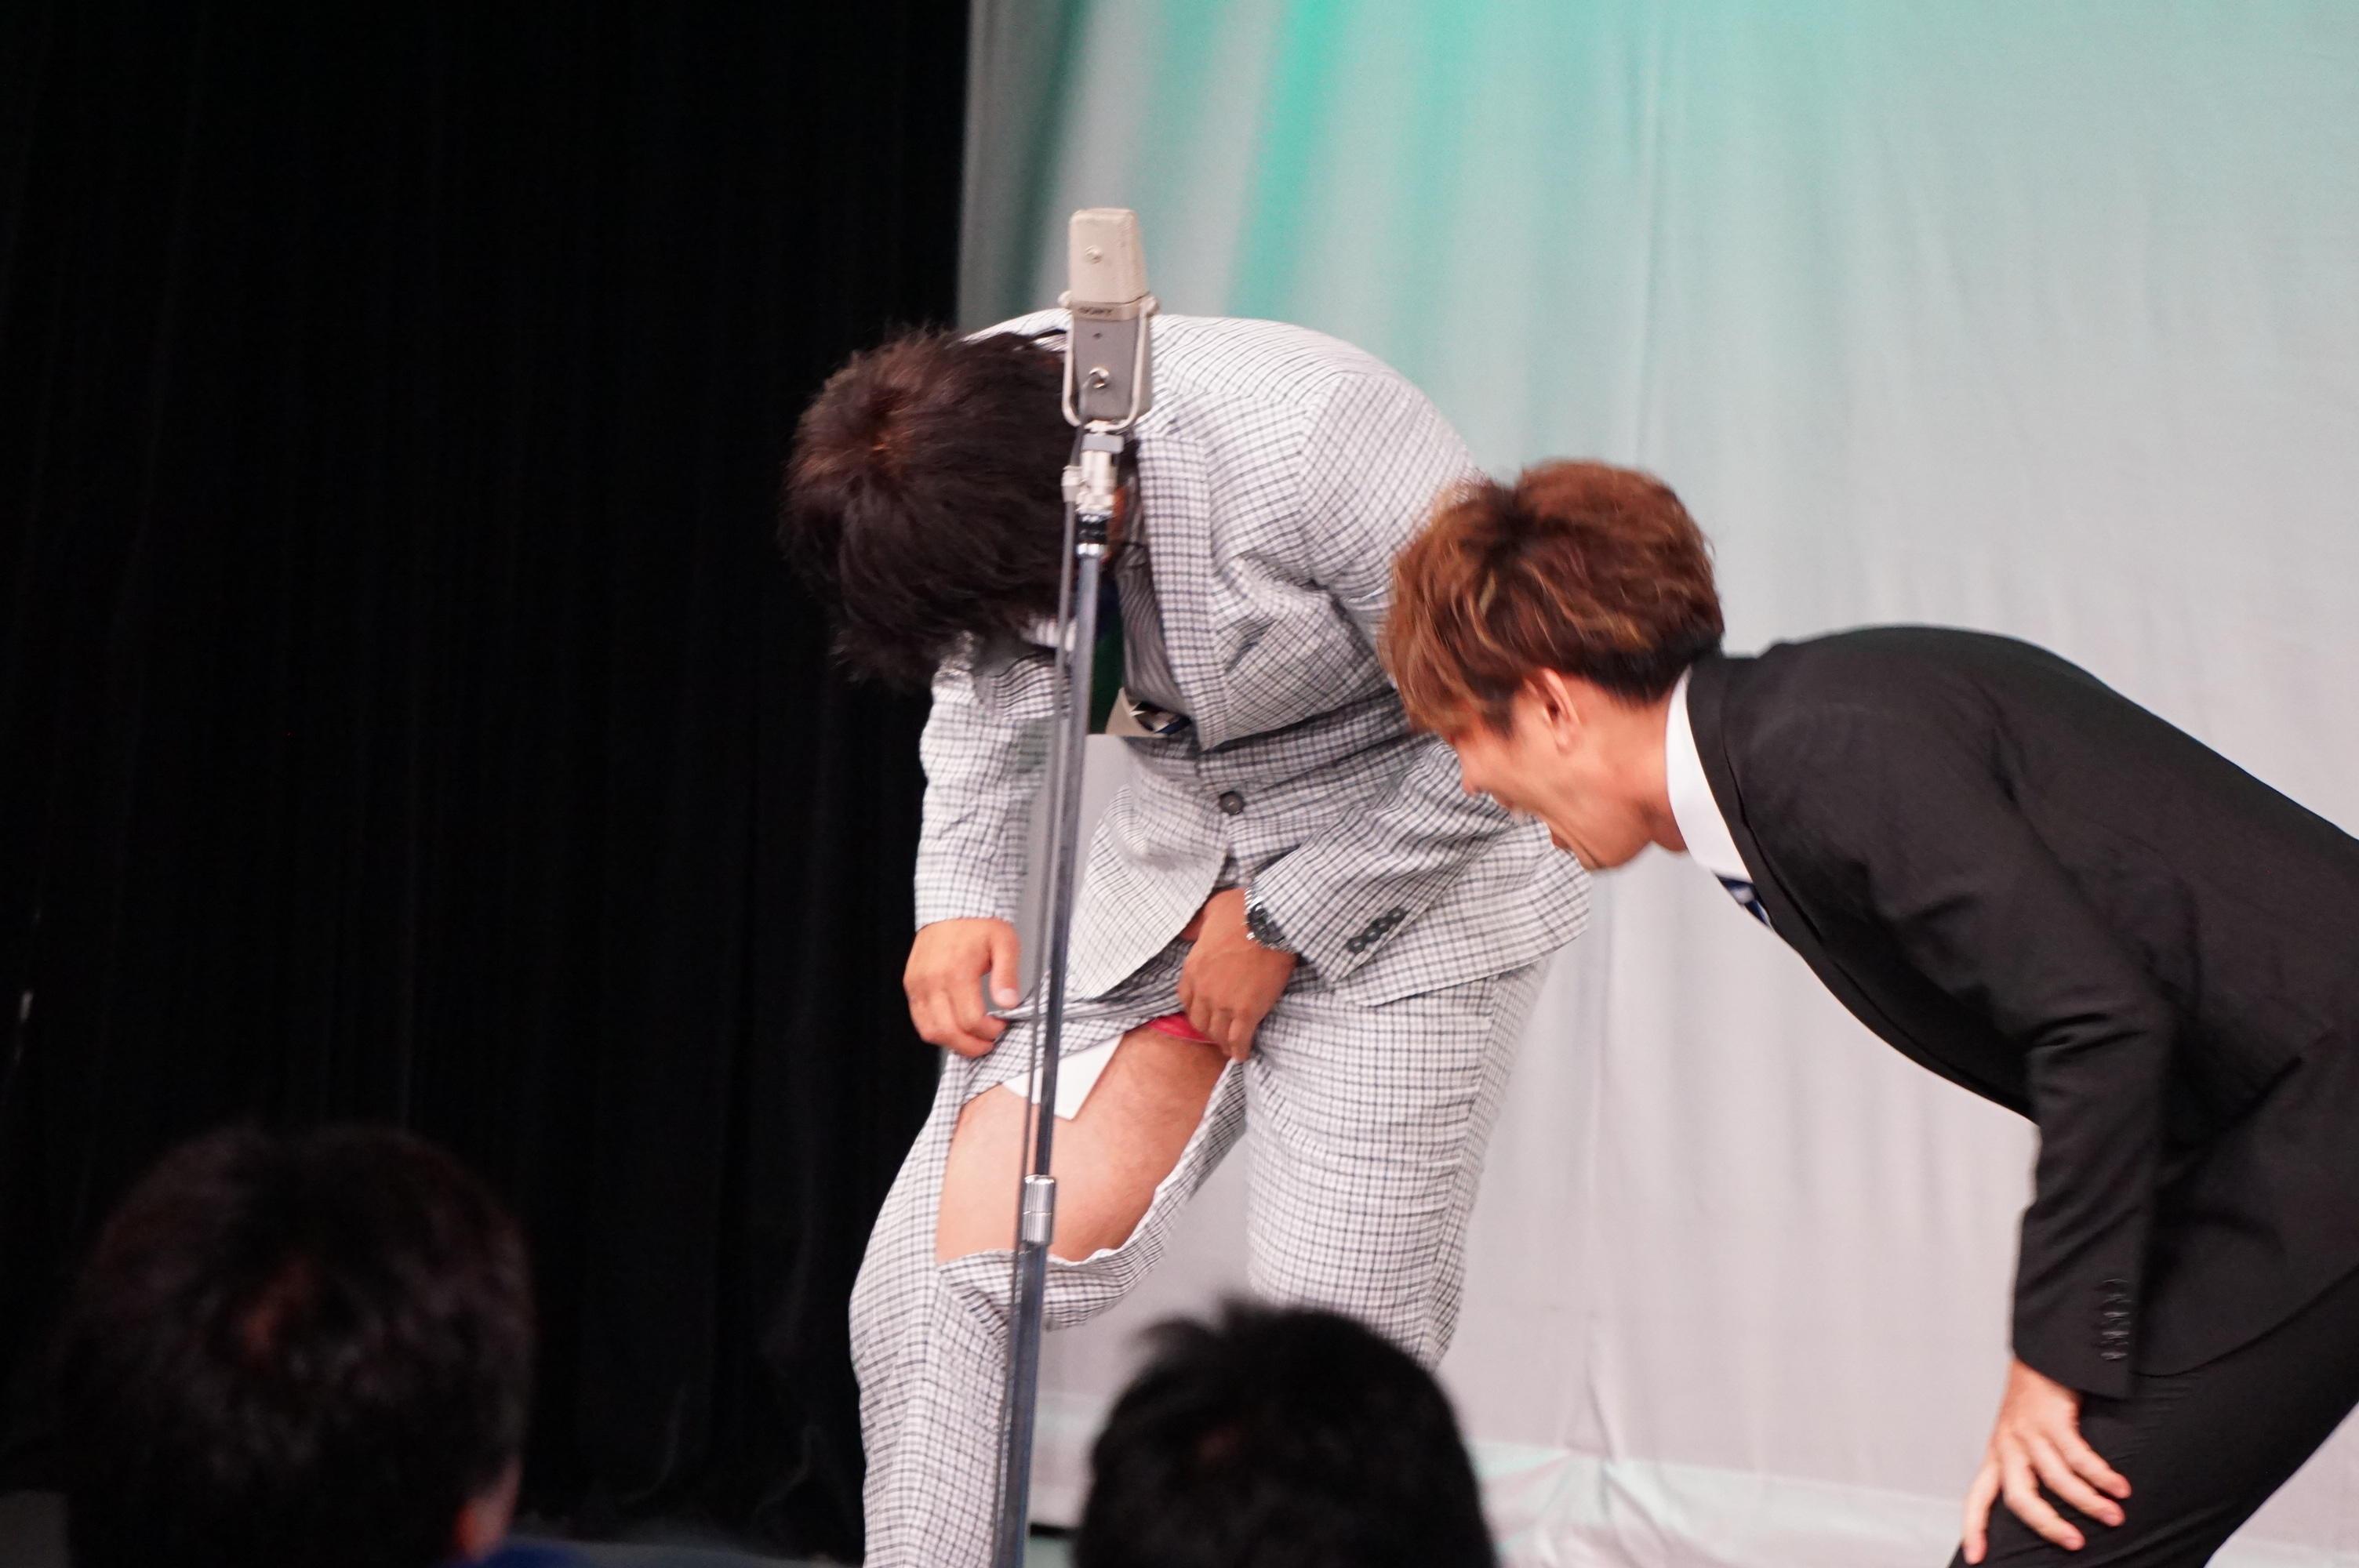 http://news.yoshimoto.co.jp/20160930203026-7320740134e9086c5c0c2c23da12fbc6d201741a.jpg